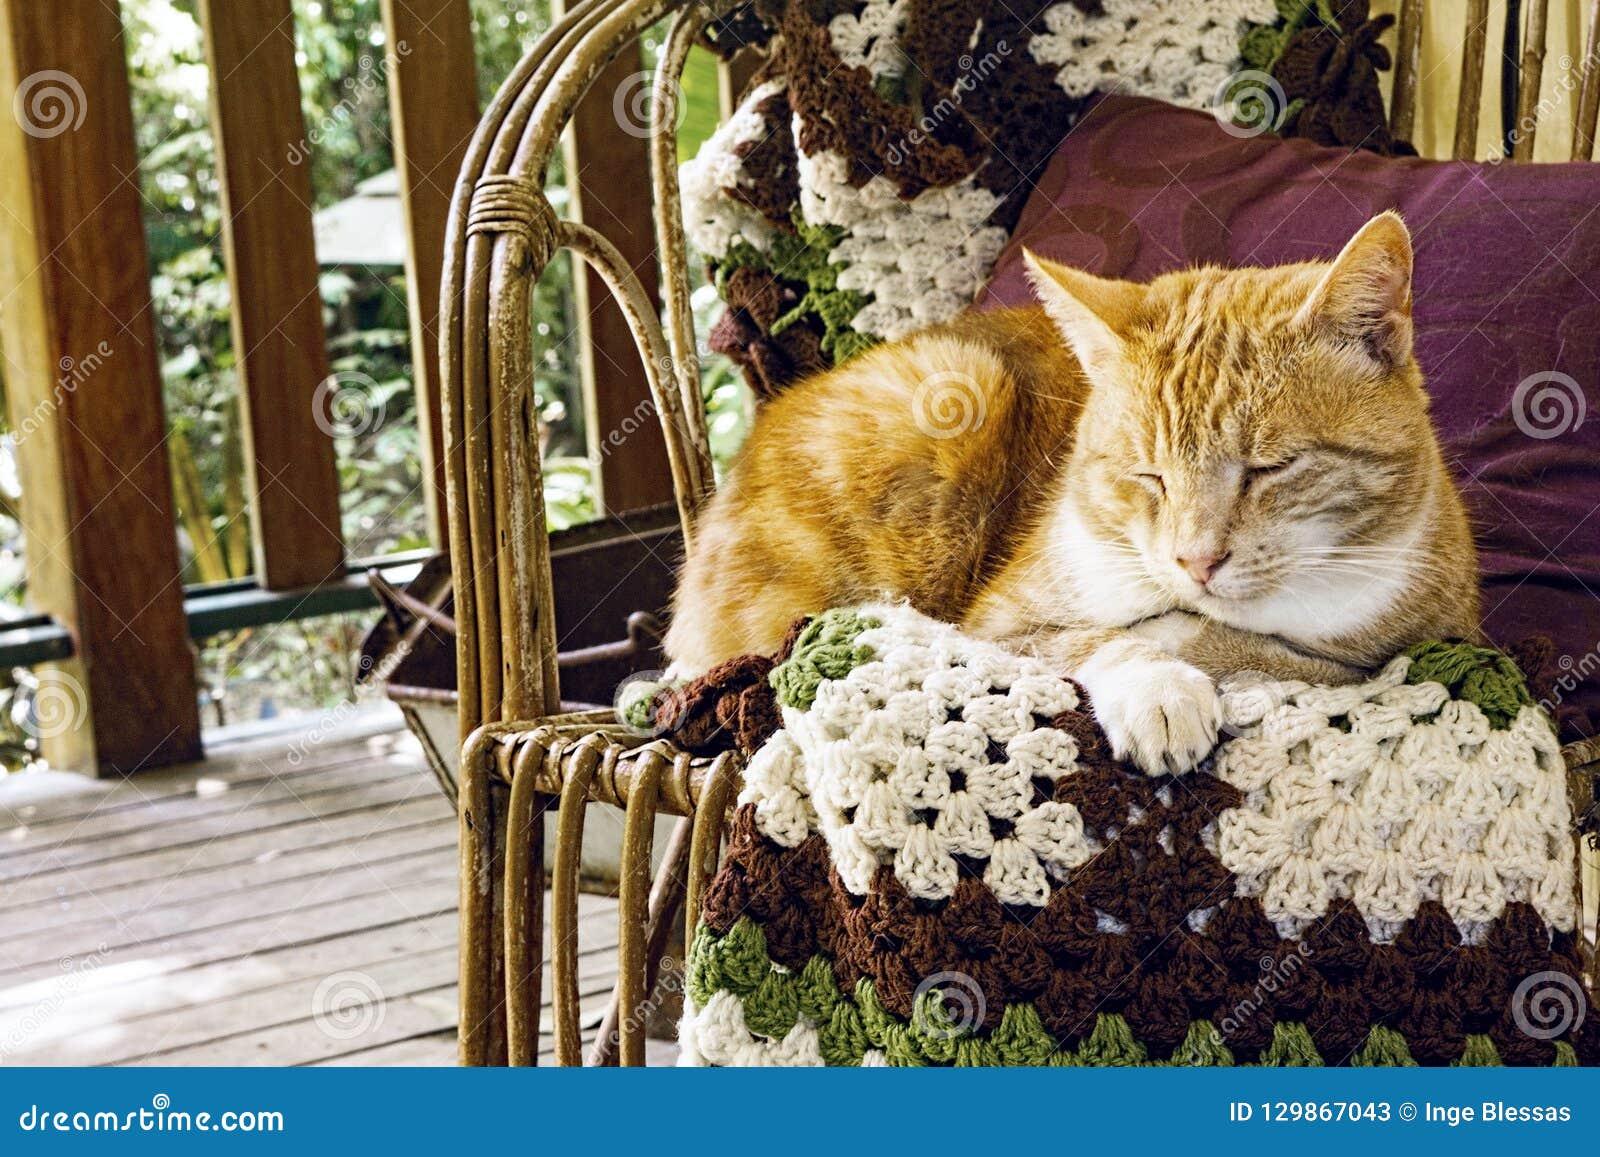 Orange marmalade cat on chair